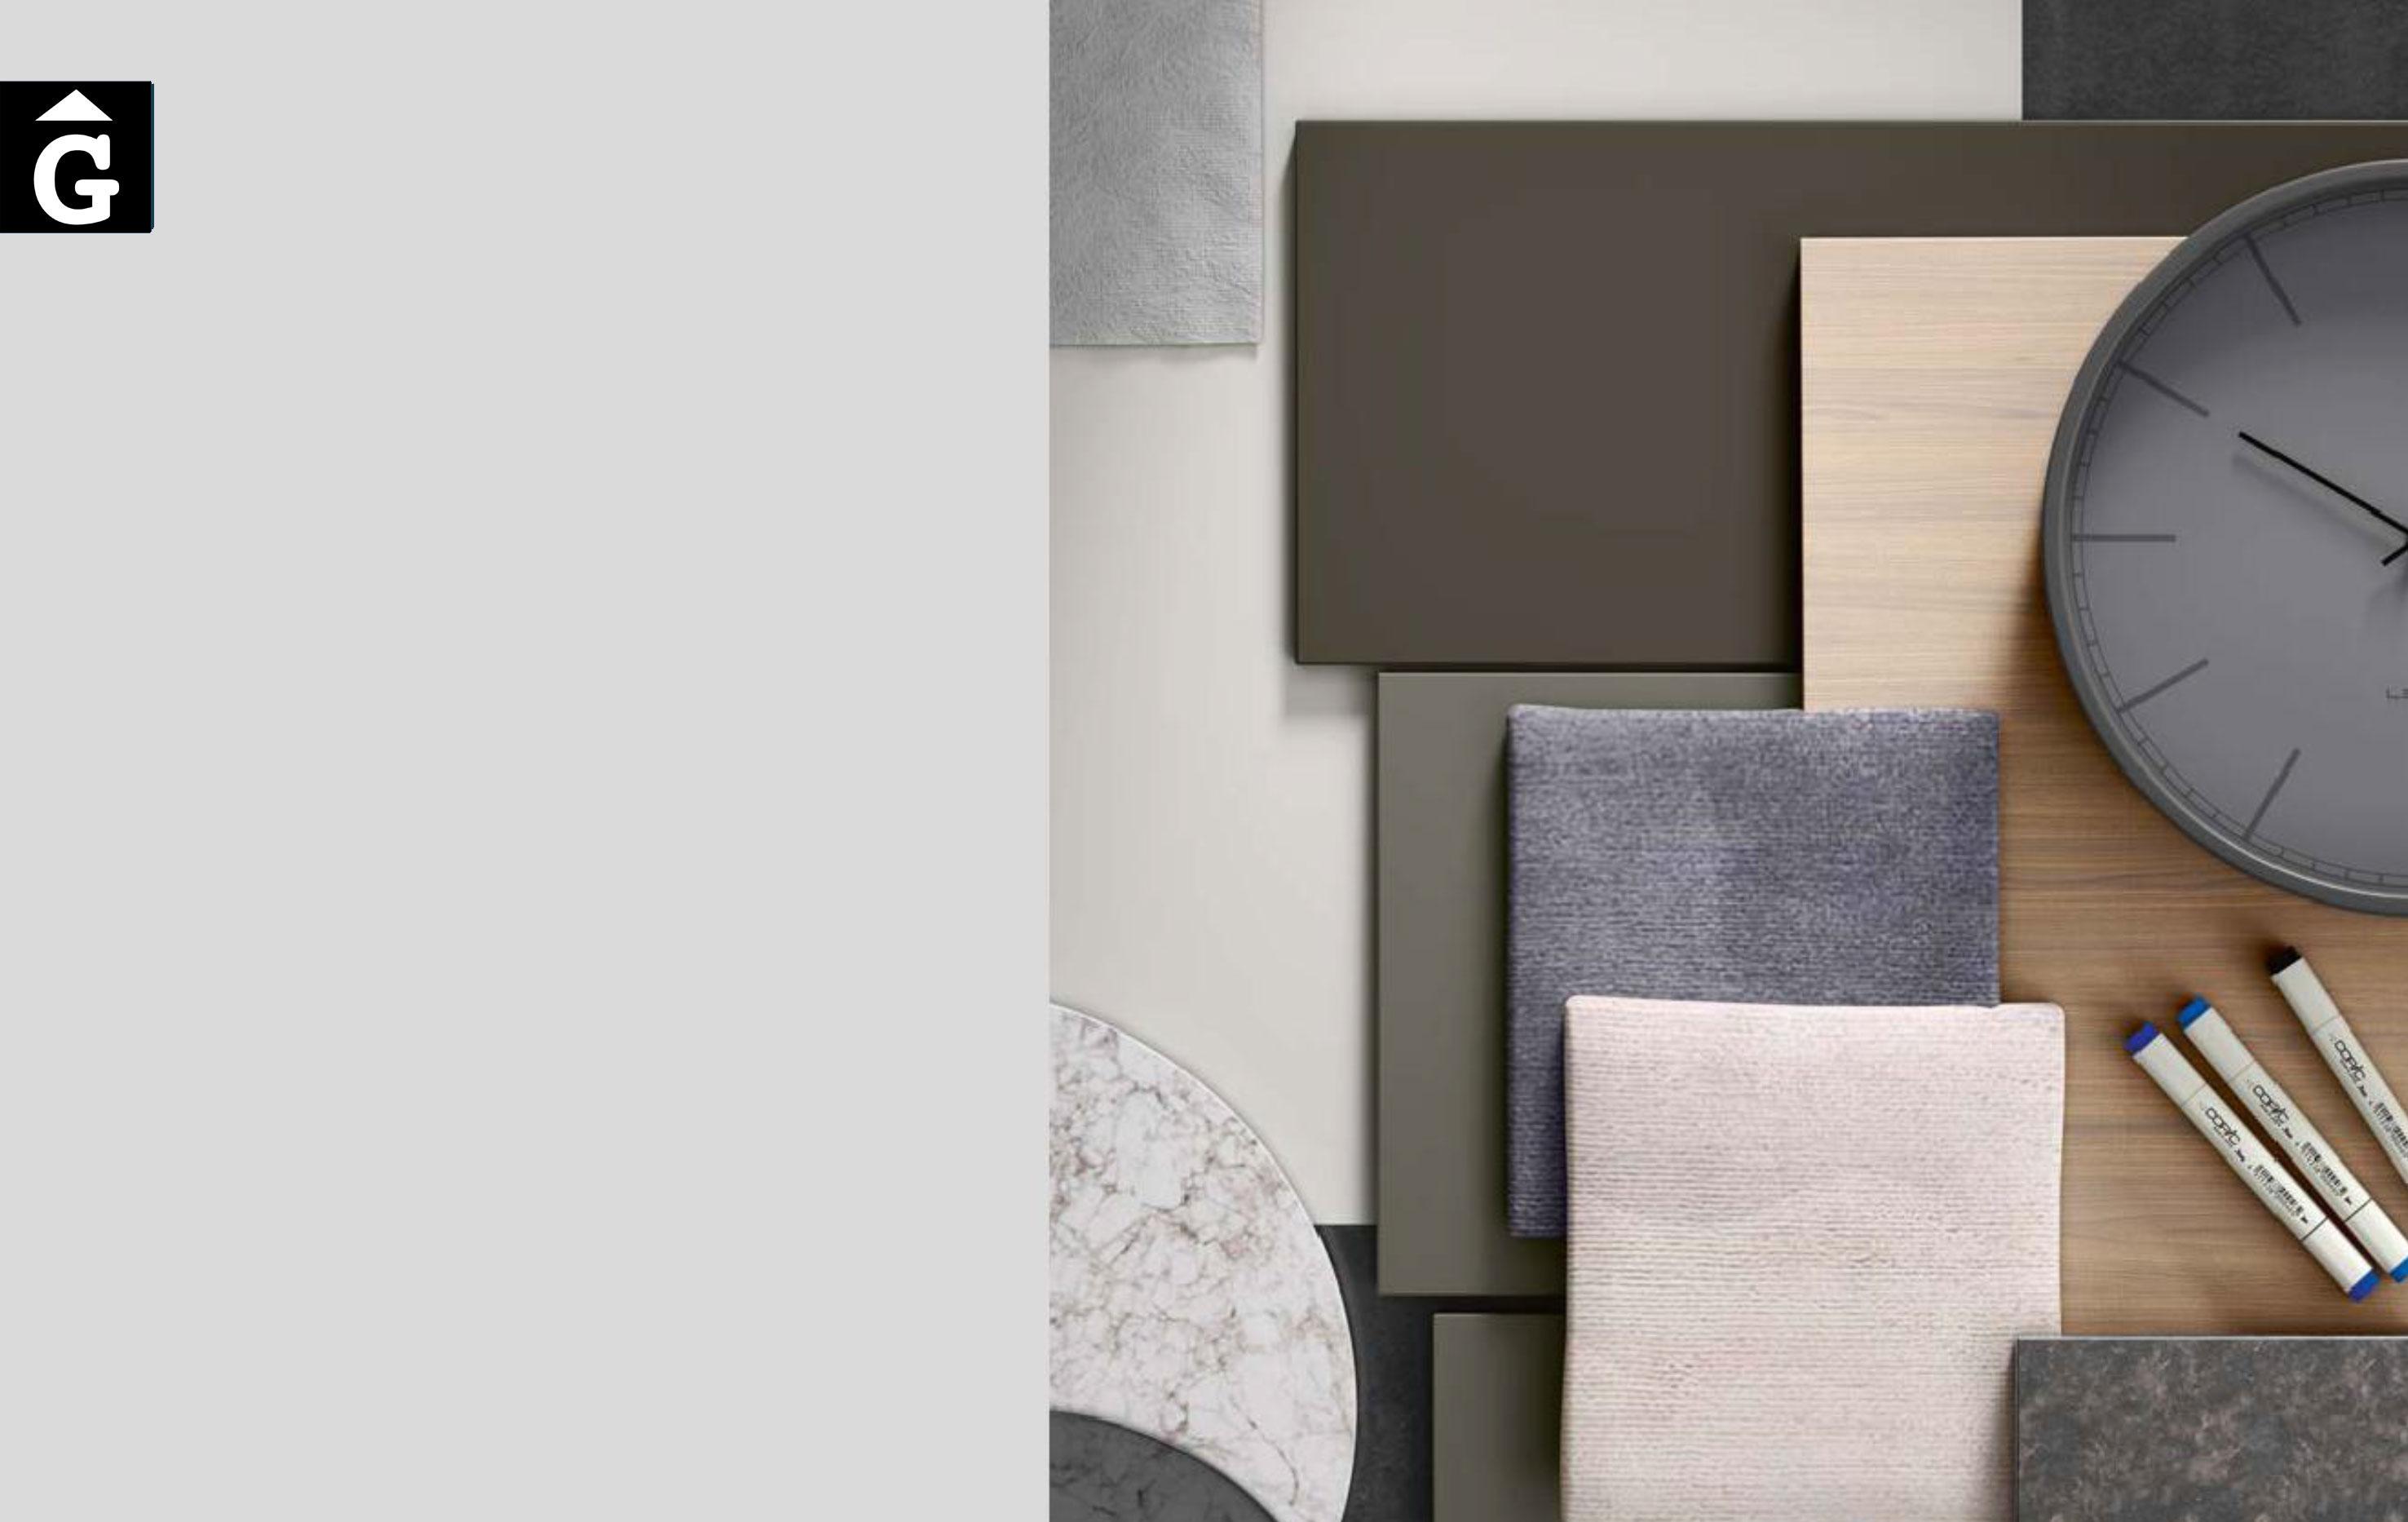 MOBLE-23-CONNECTOR-EMEDE-mobles-by-Mobles-GIFREU-Girona-ESPAI-EMEDE-Epacio-emede-Muebles-MD-moble-menjador-Sala-estar-habitatge-qualitat-laca-xapa-natural